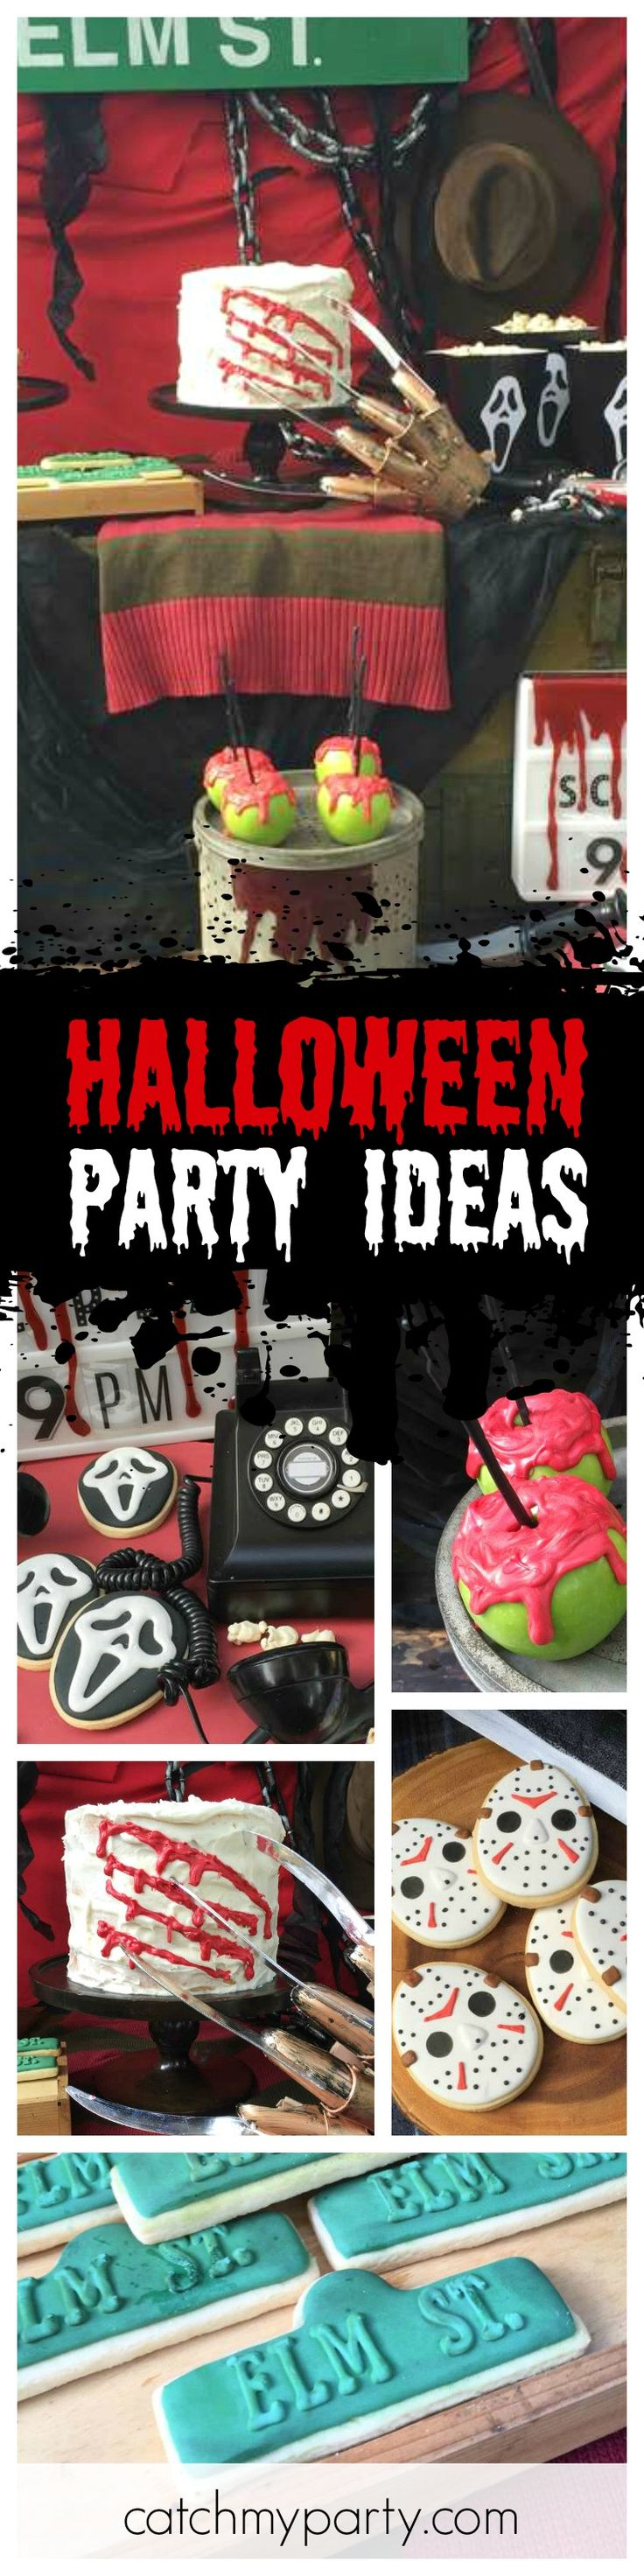 Best 25+ Horror party ideas on Pinterest | Haloween party, Creepy ...